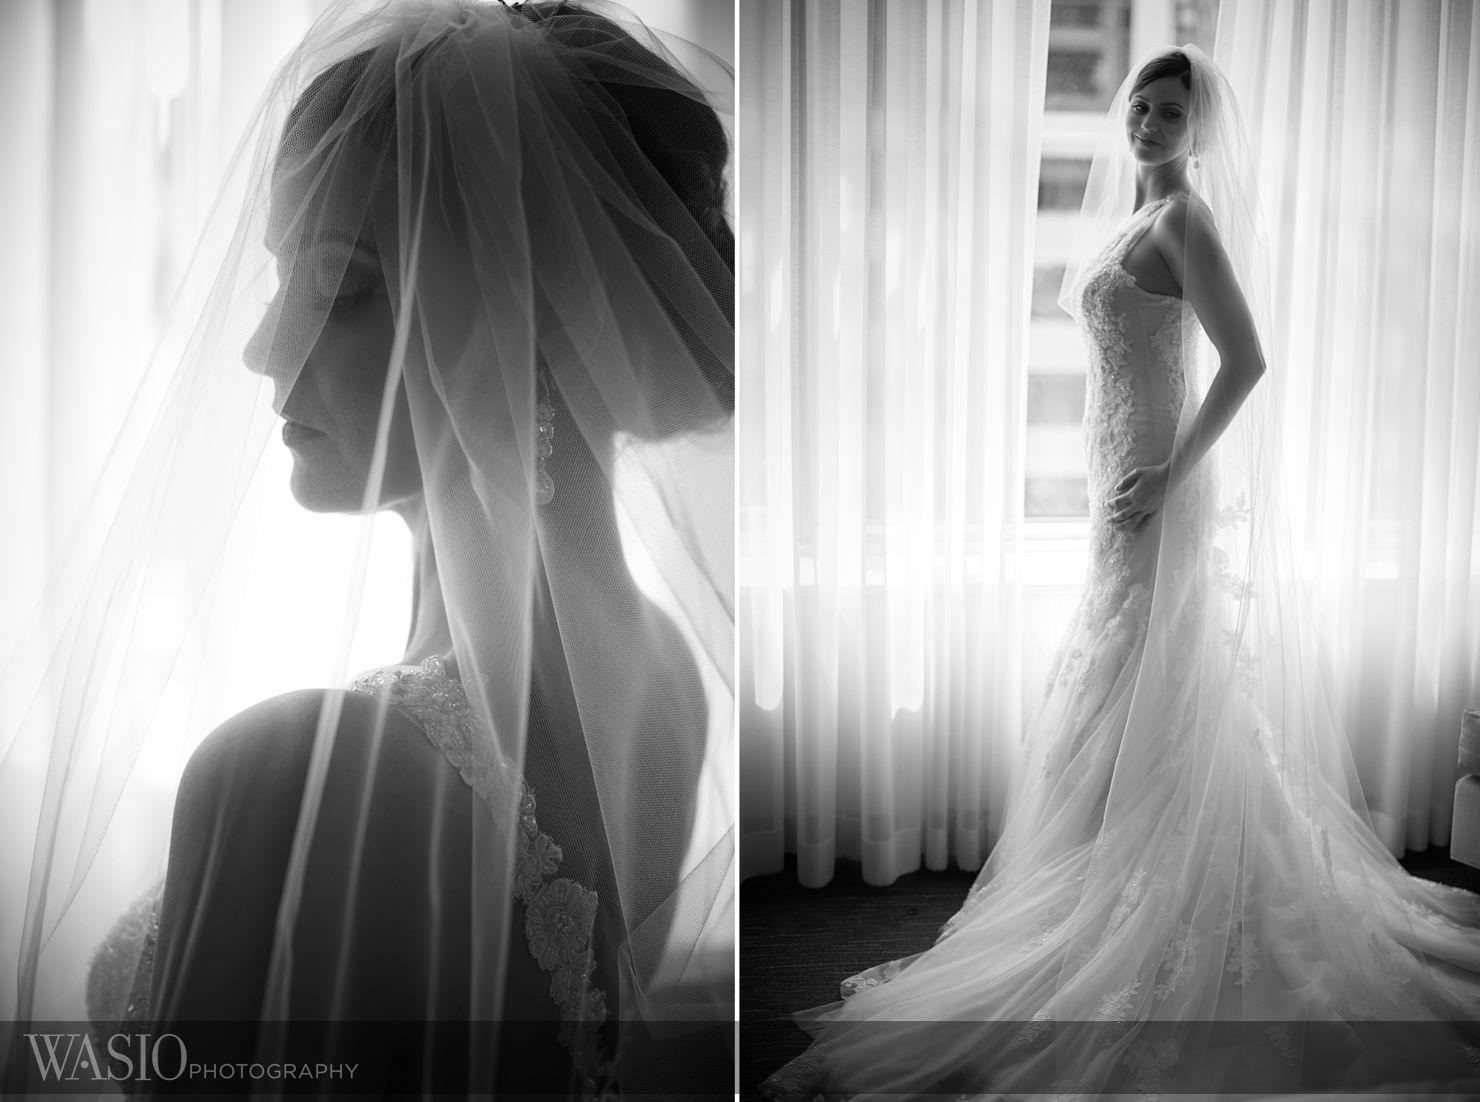 08_Venue-One-Wedding_Chicago_the-wit_3P4C1580-copy Venue One Wedding - Tracy & John